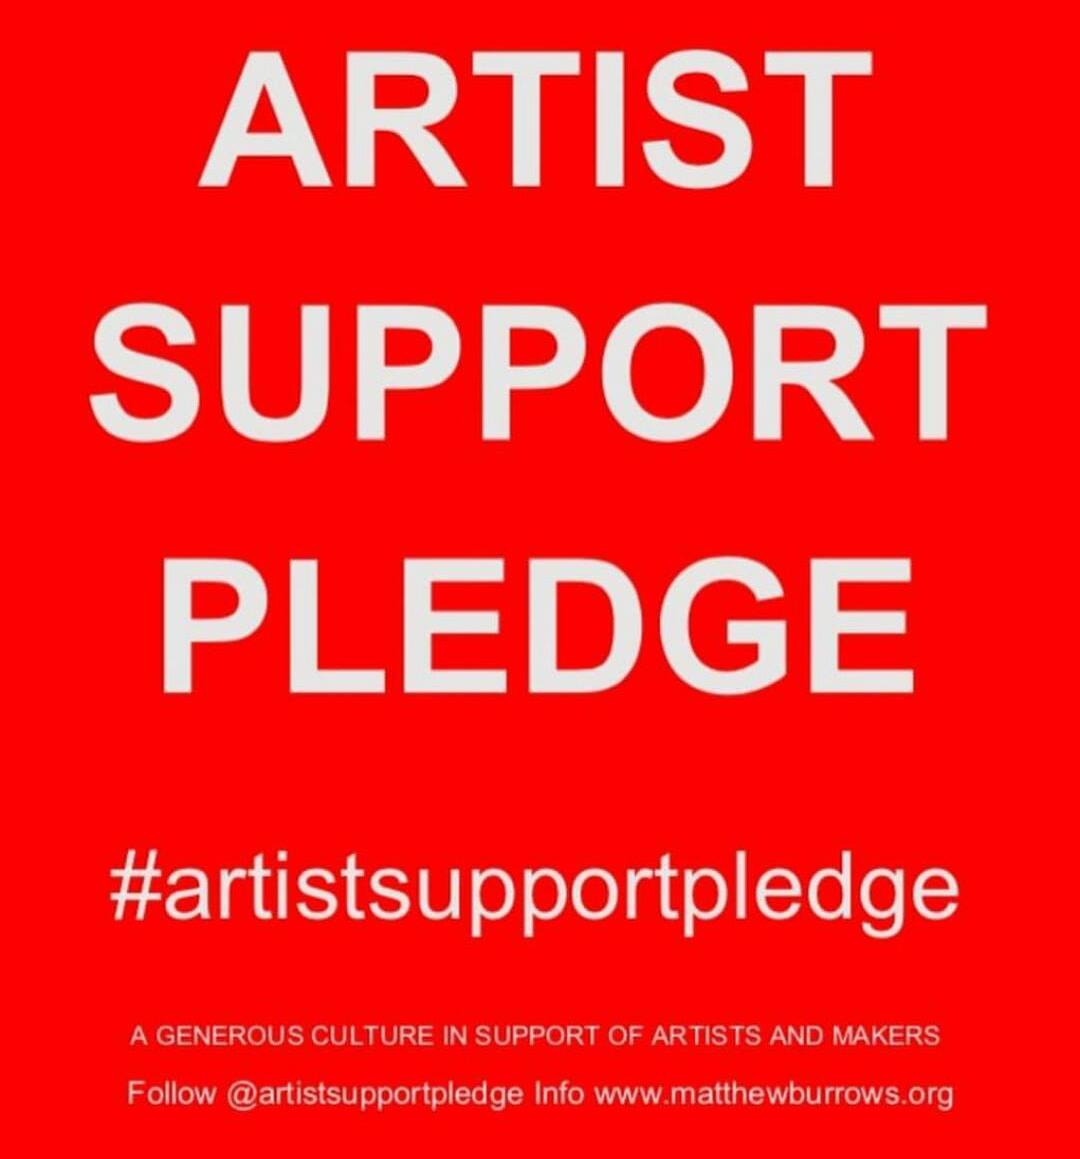 #artistsupporpledge